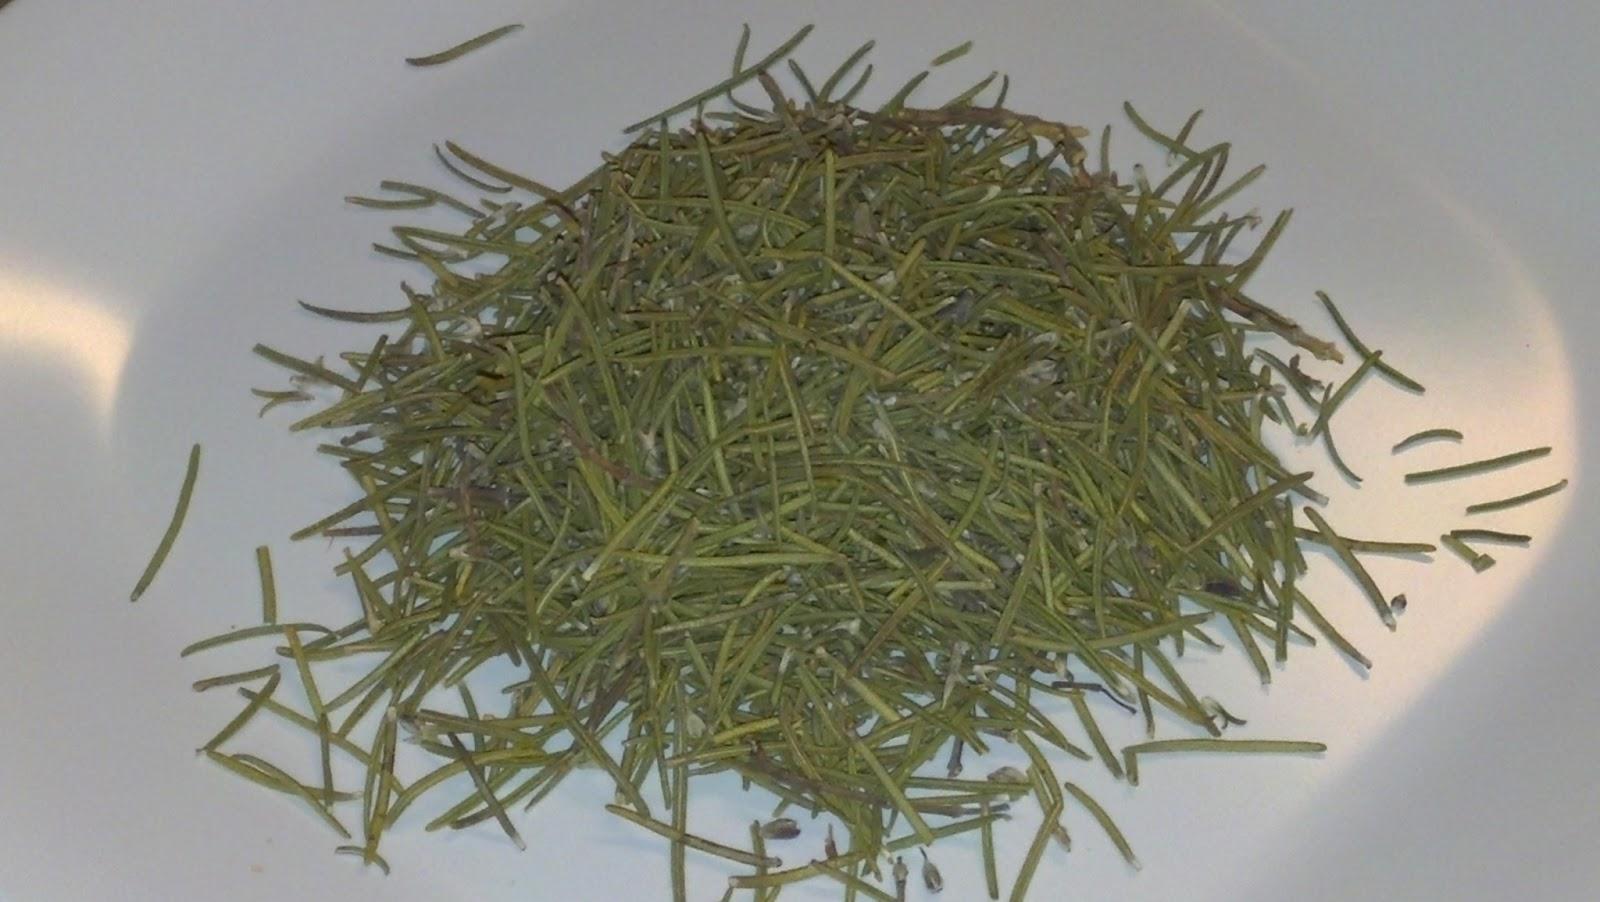 Back to the Basics!: Health Benefits of Rosemary